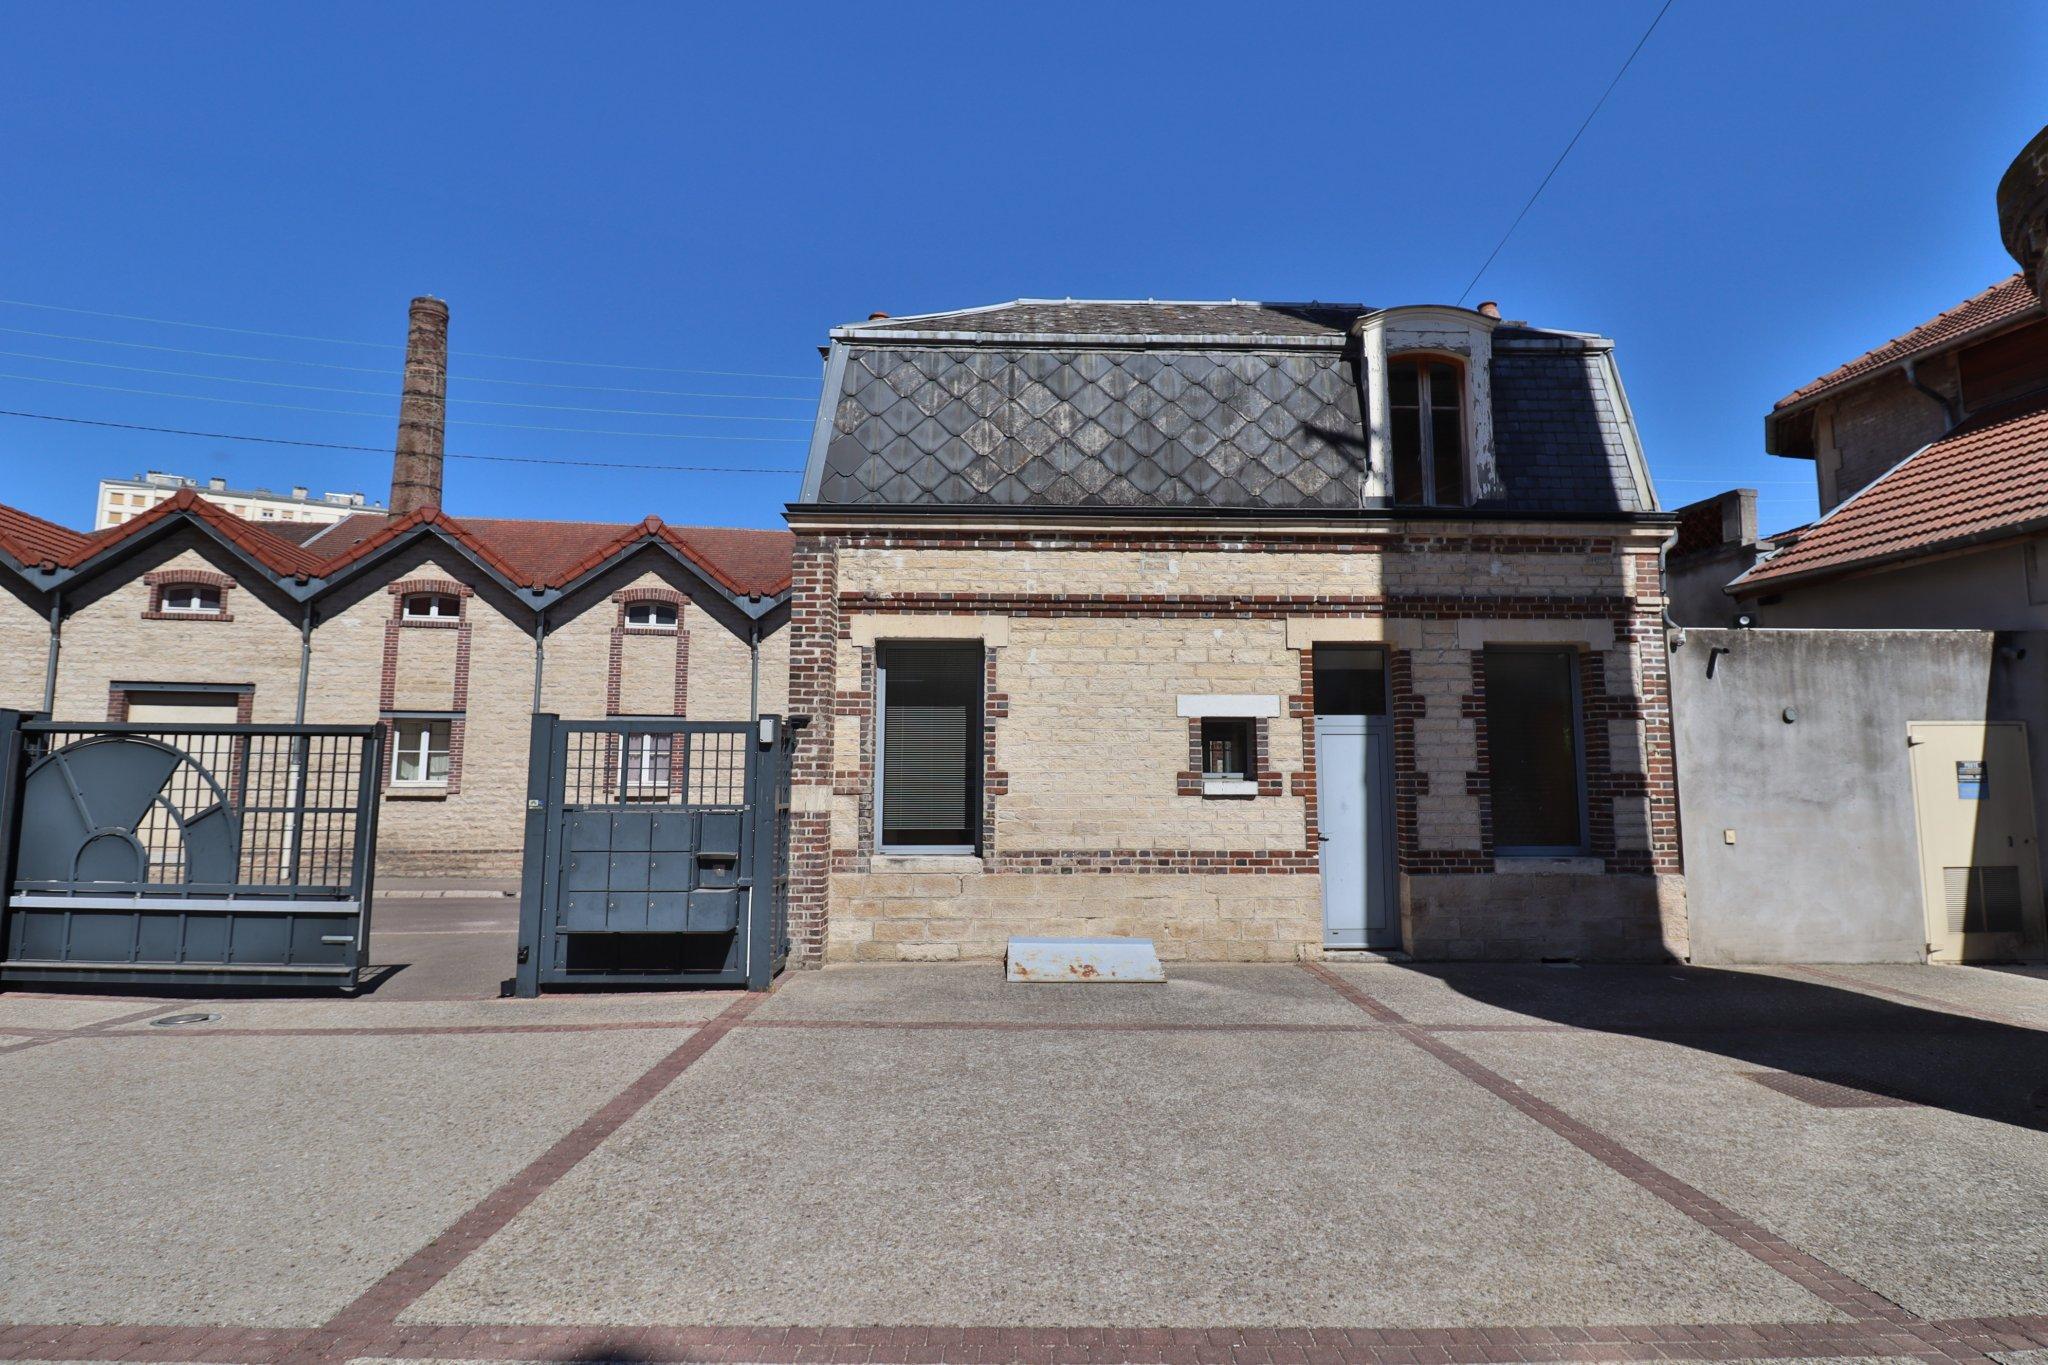 Damonte Achat appartement - Réf n° 1_19002A